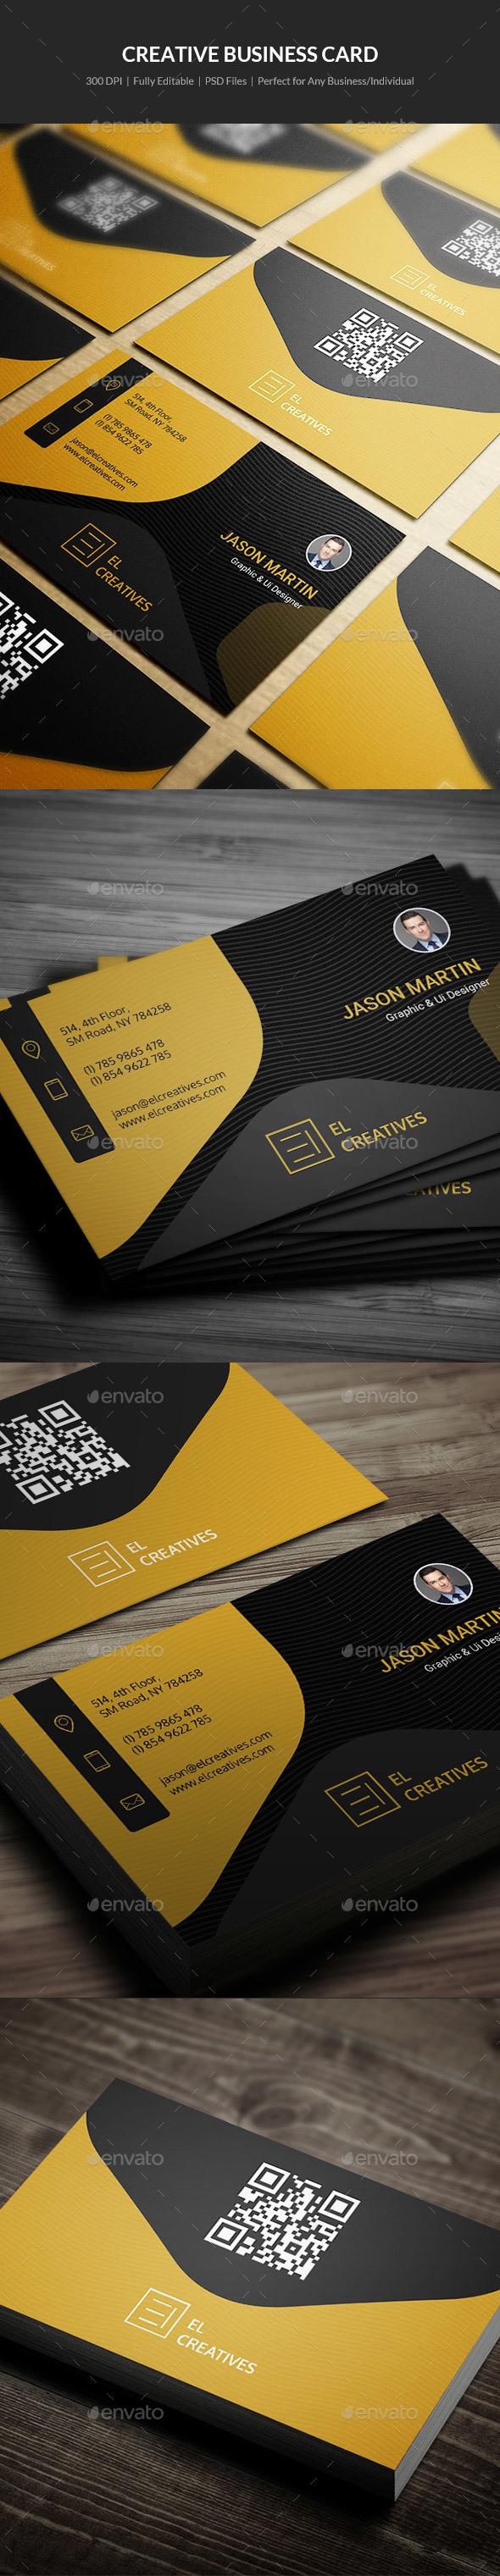 Creative Business Card - 13 - Creative Business Cards